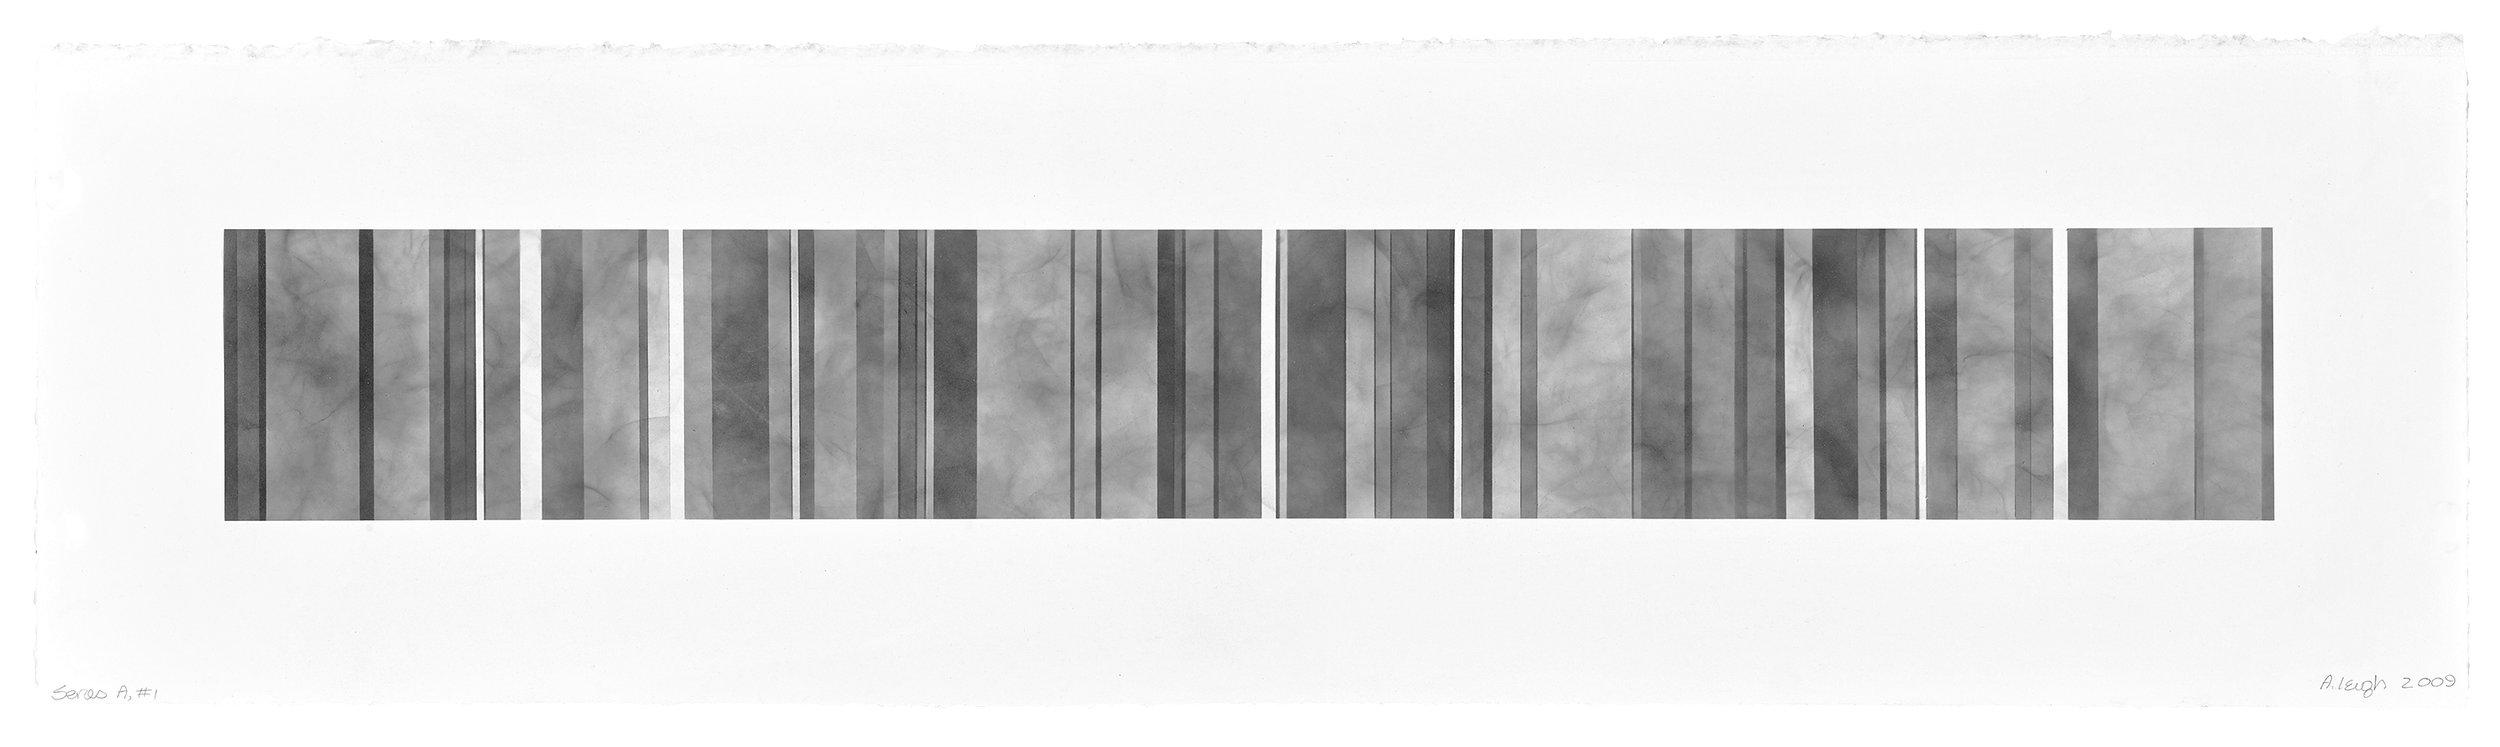 Barcode Series D 13, 2018 copy.jpg